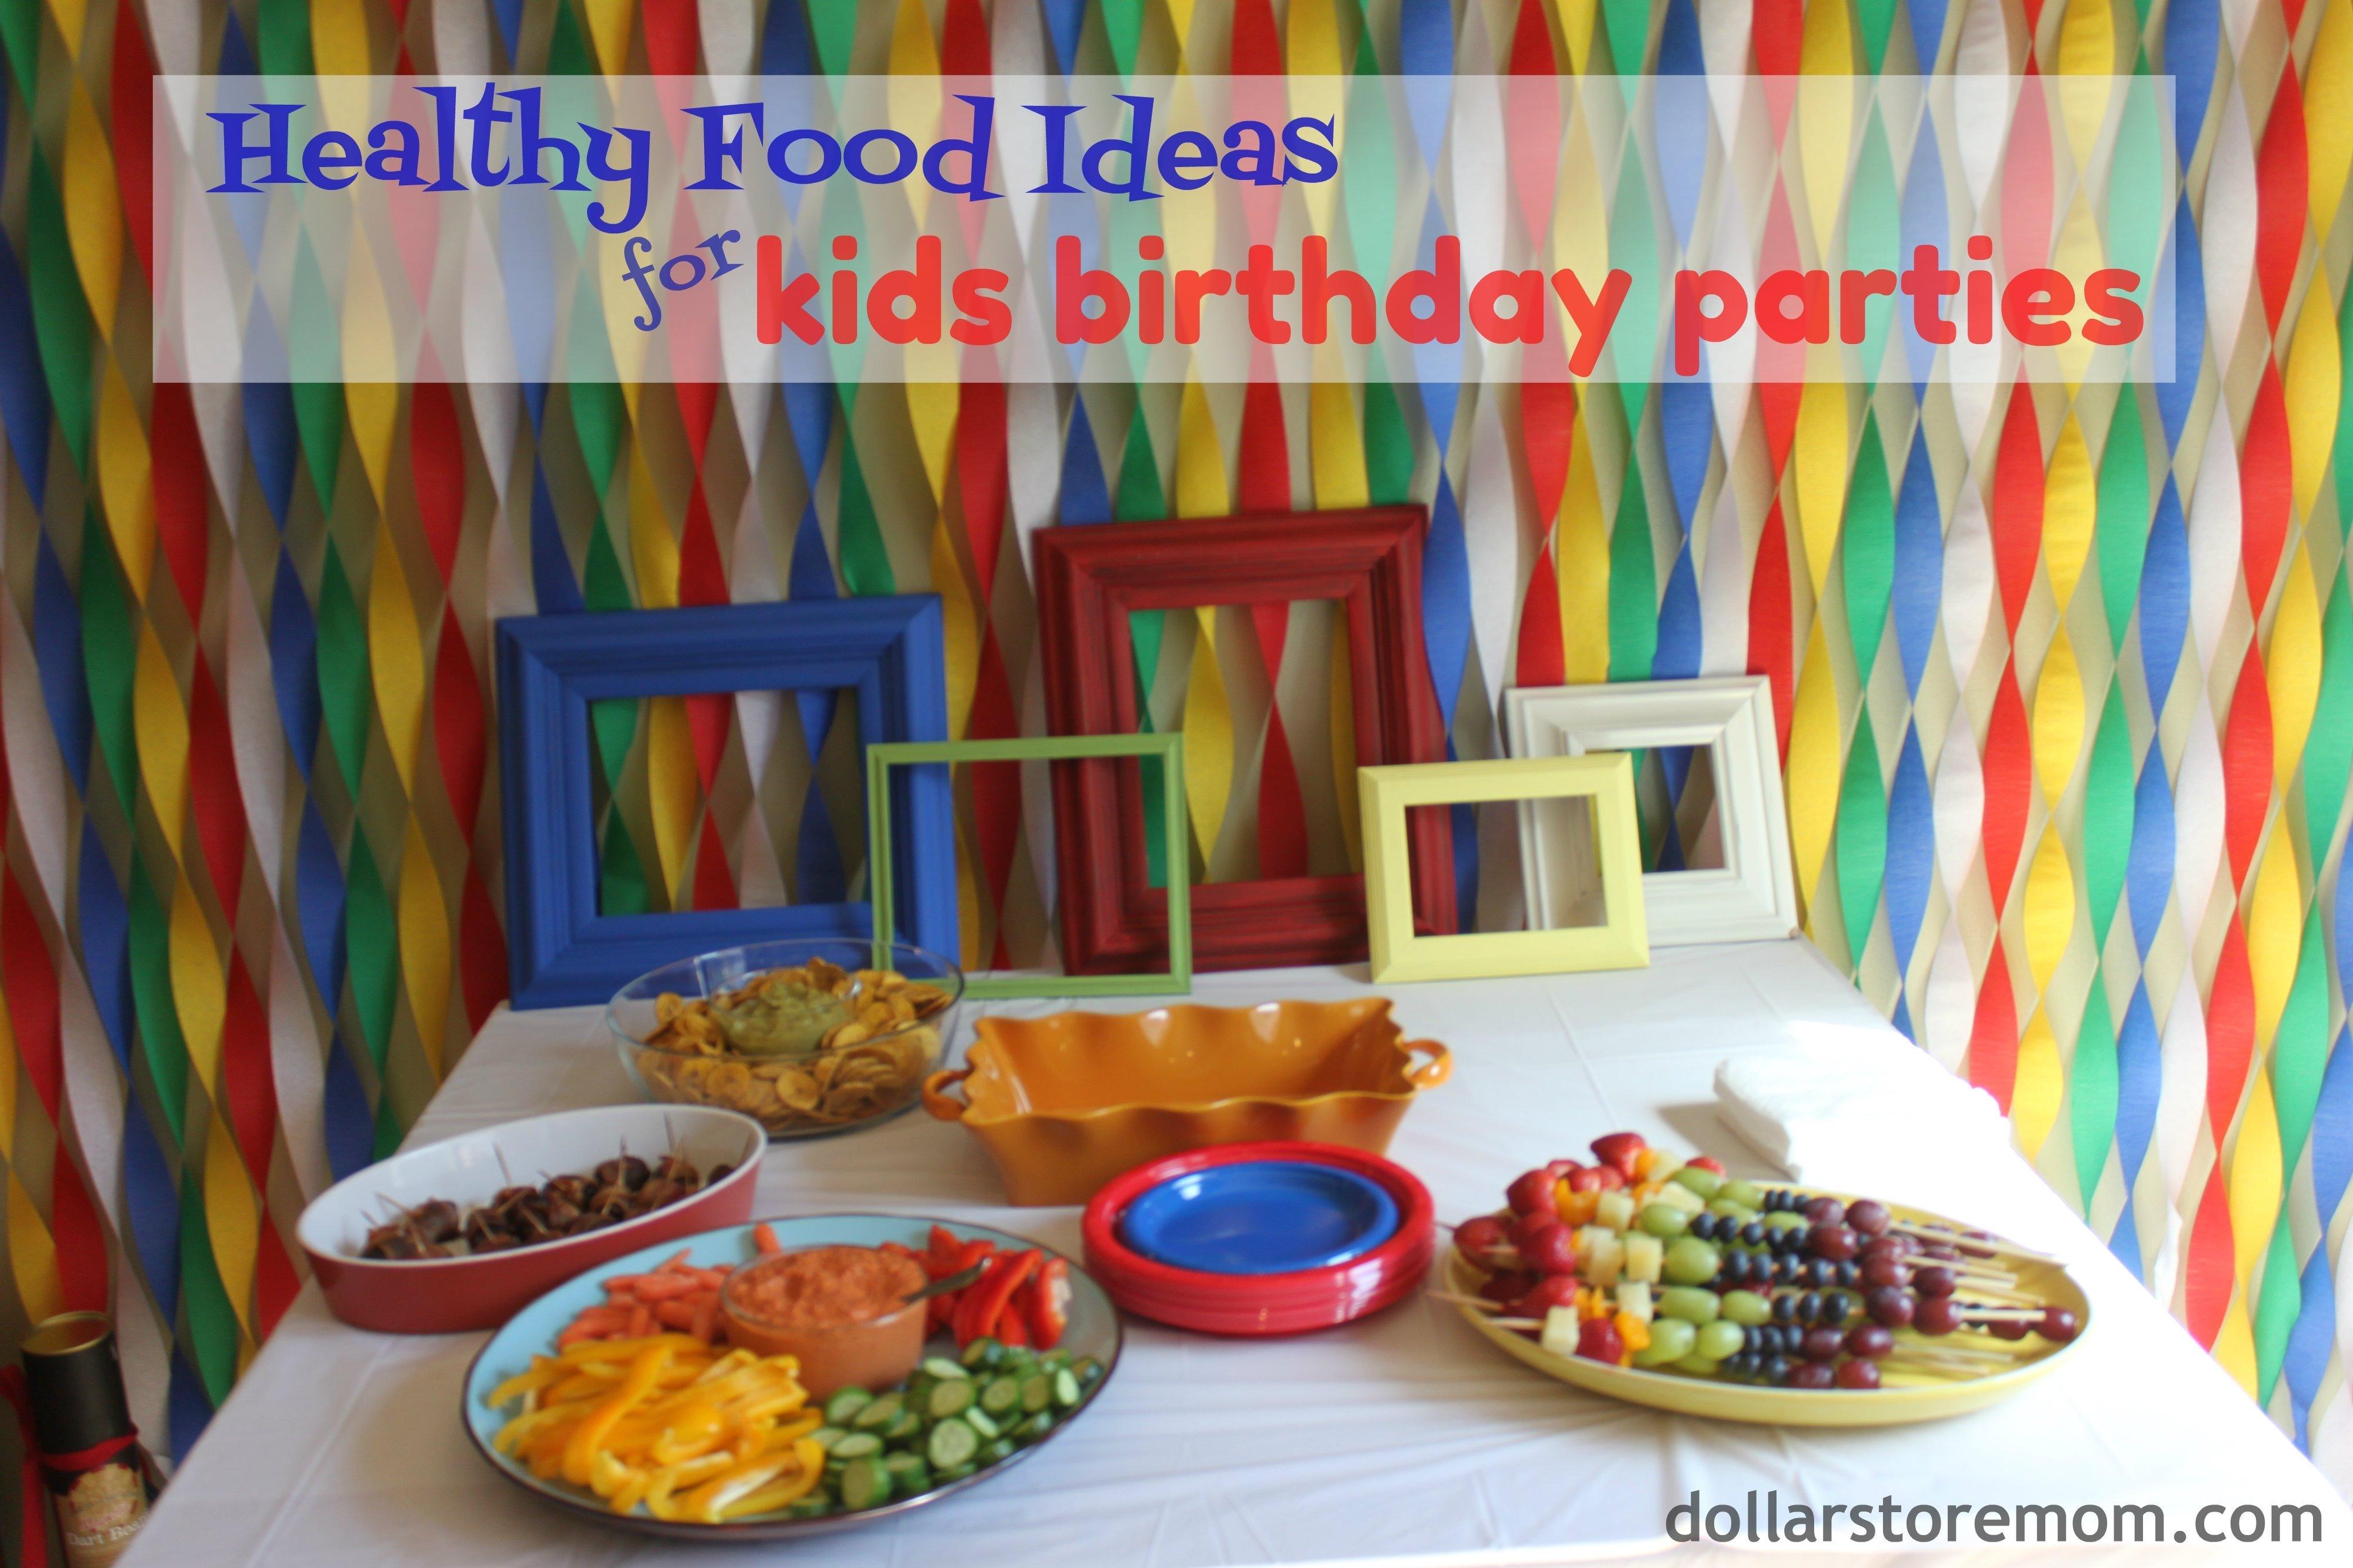 10 Most Popular Finger Food Ideas For Kids Birthday Party kids birthday party food ideas dollar store mom 2021